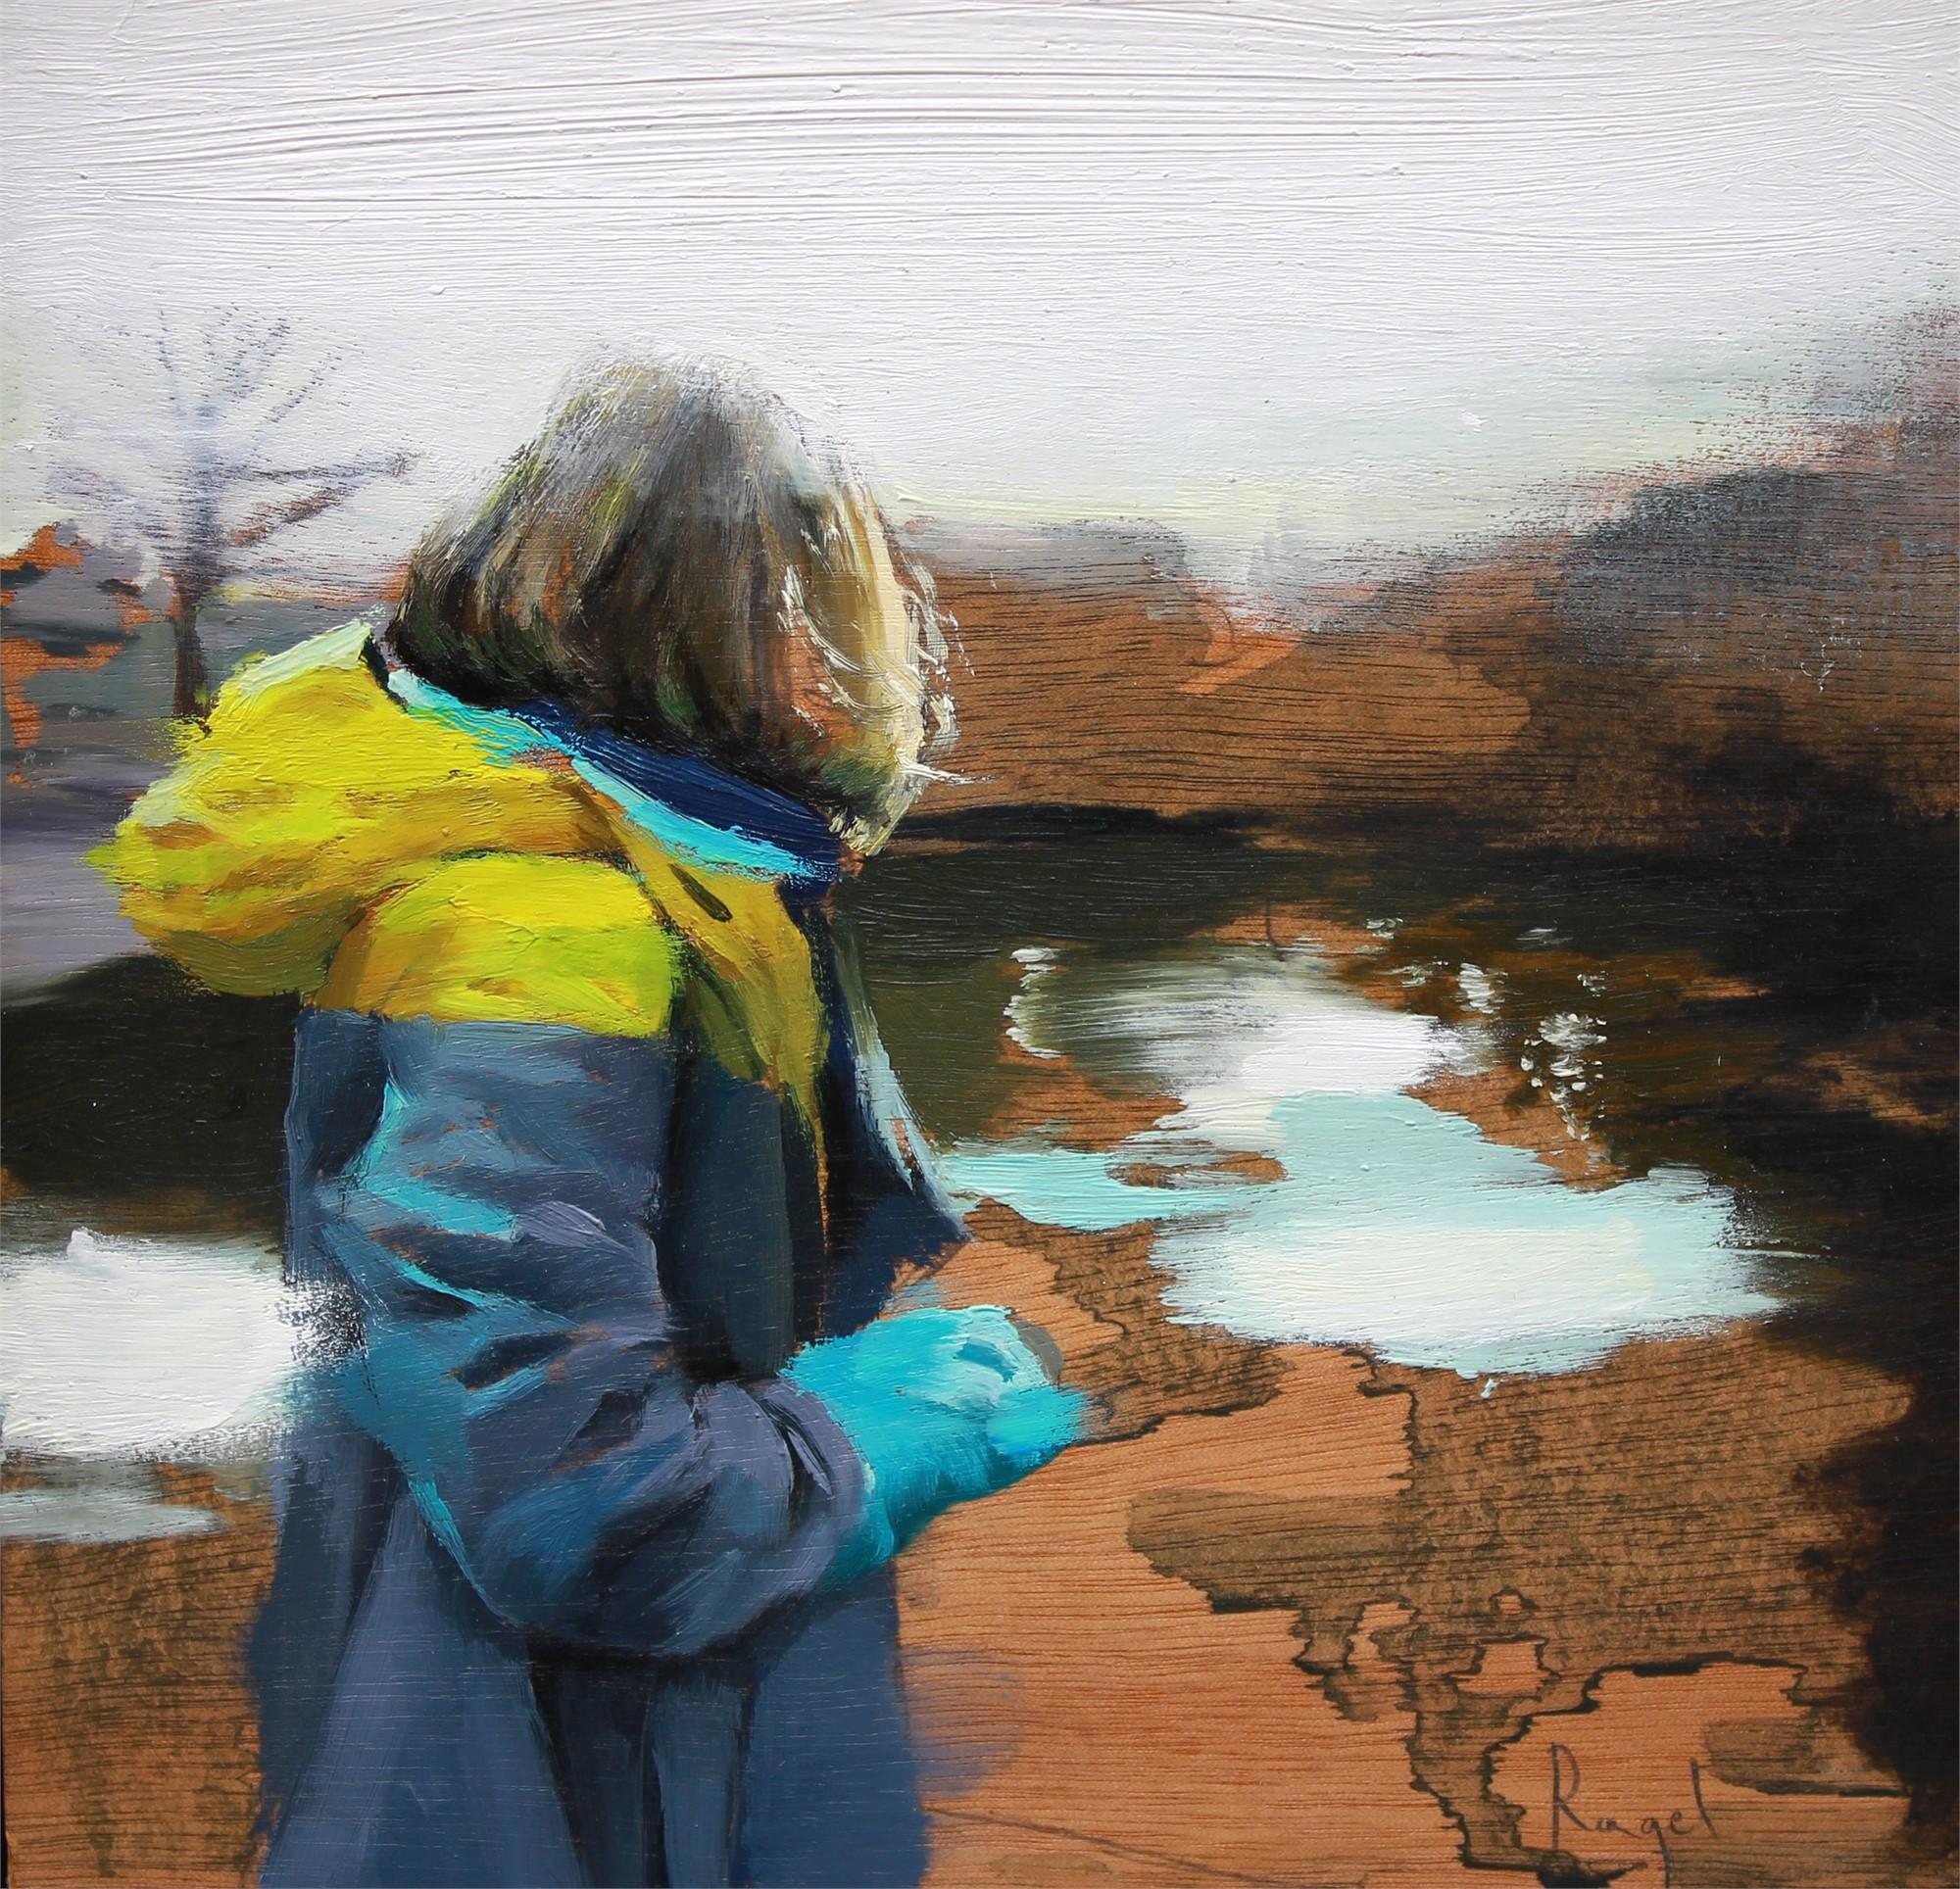 Dream by Susana Ragel